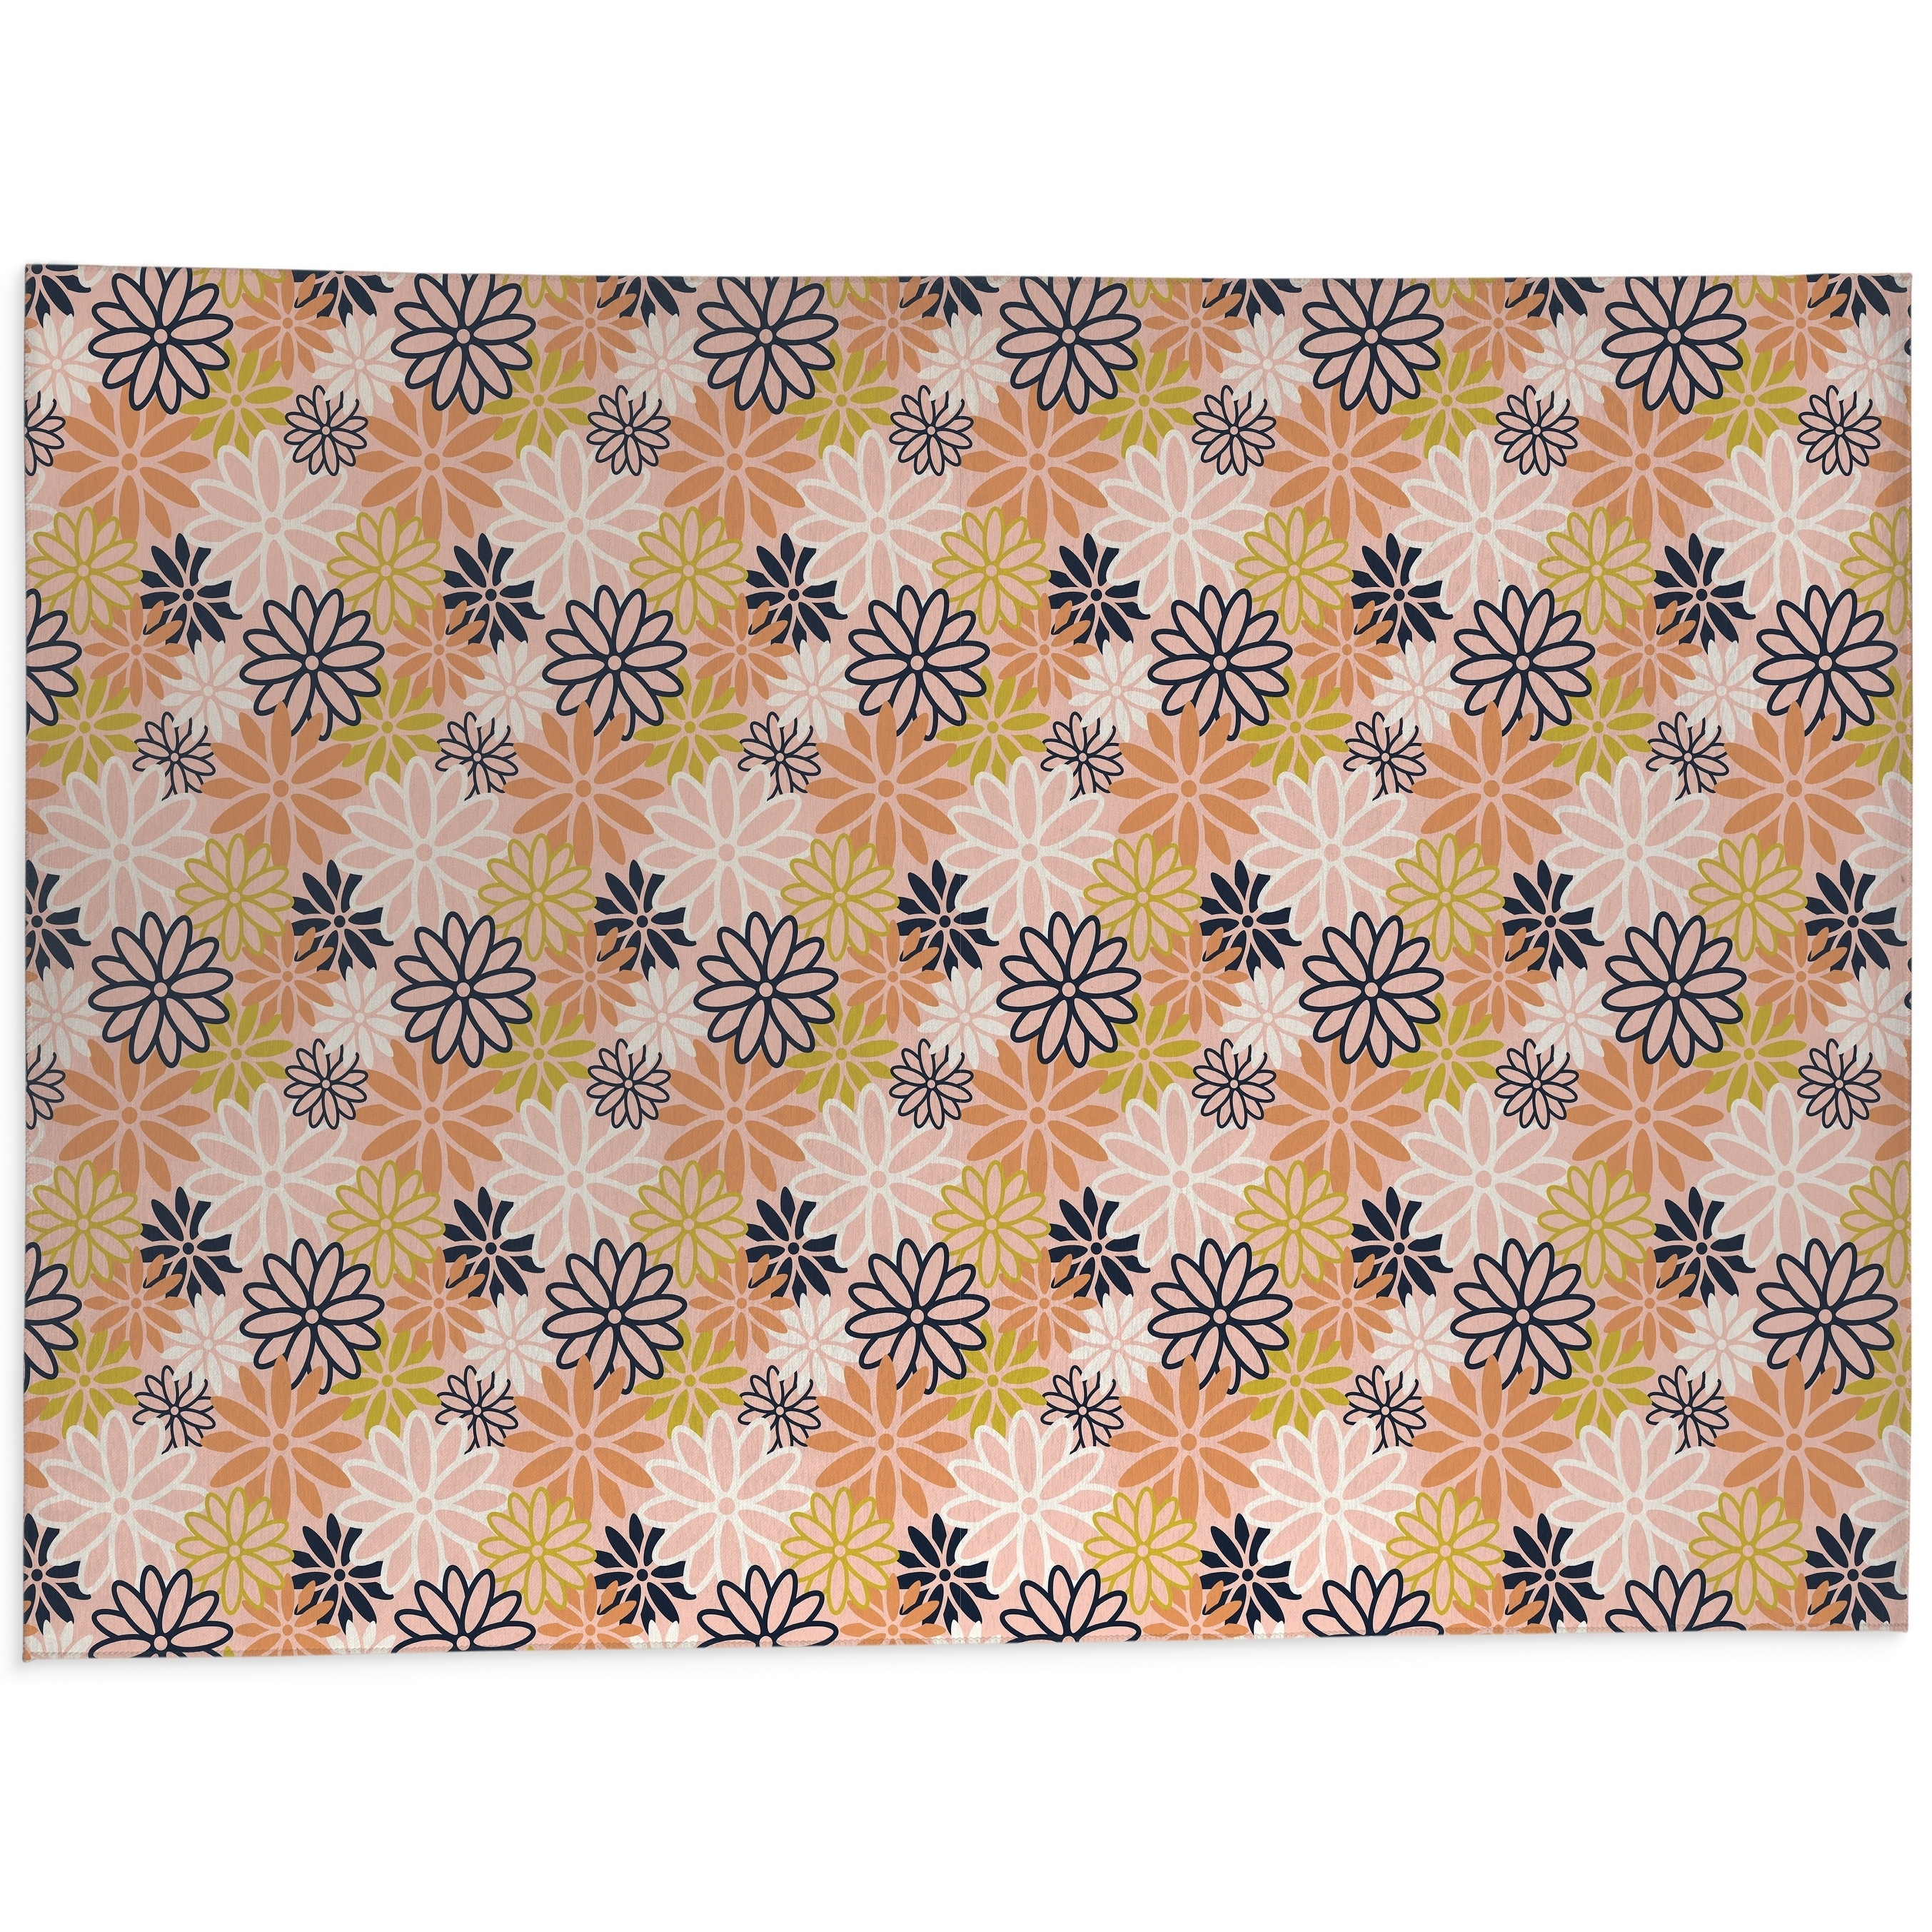 Shop Beatnik Floral Peach Kitchen Mat By Kavka Designs Overstock 30585542